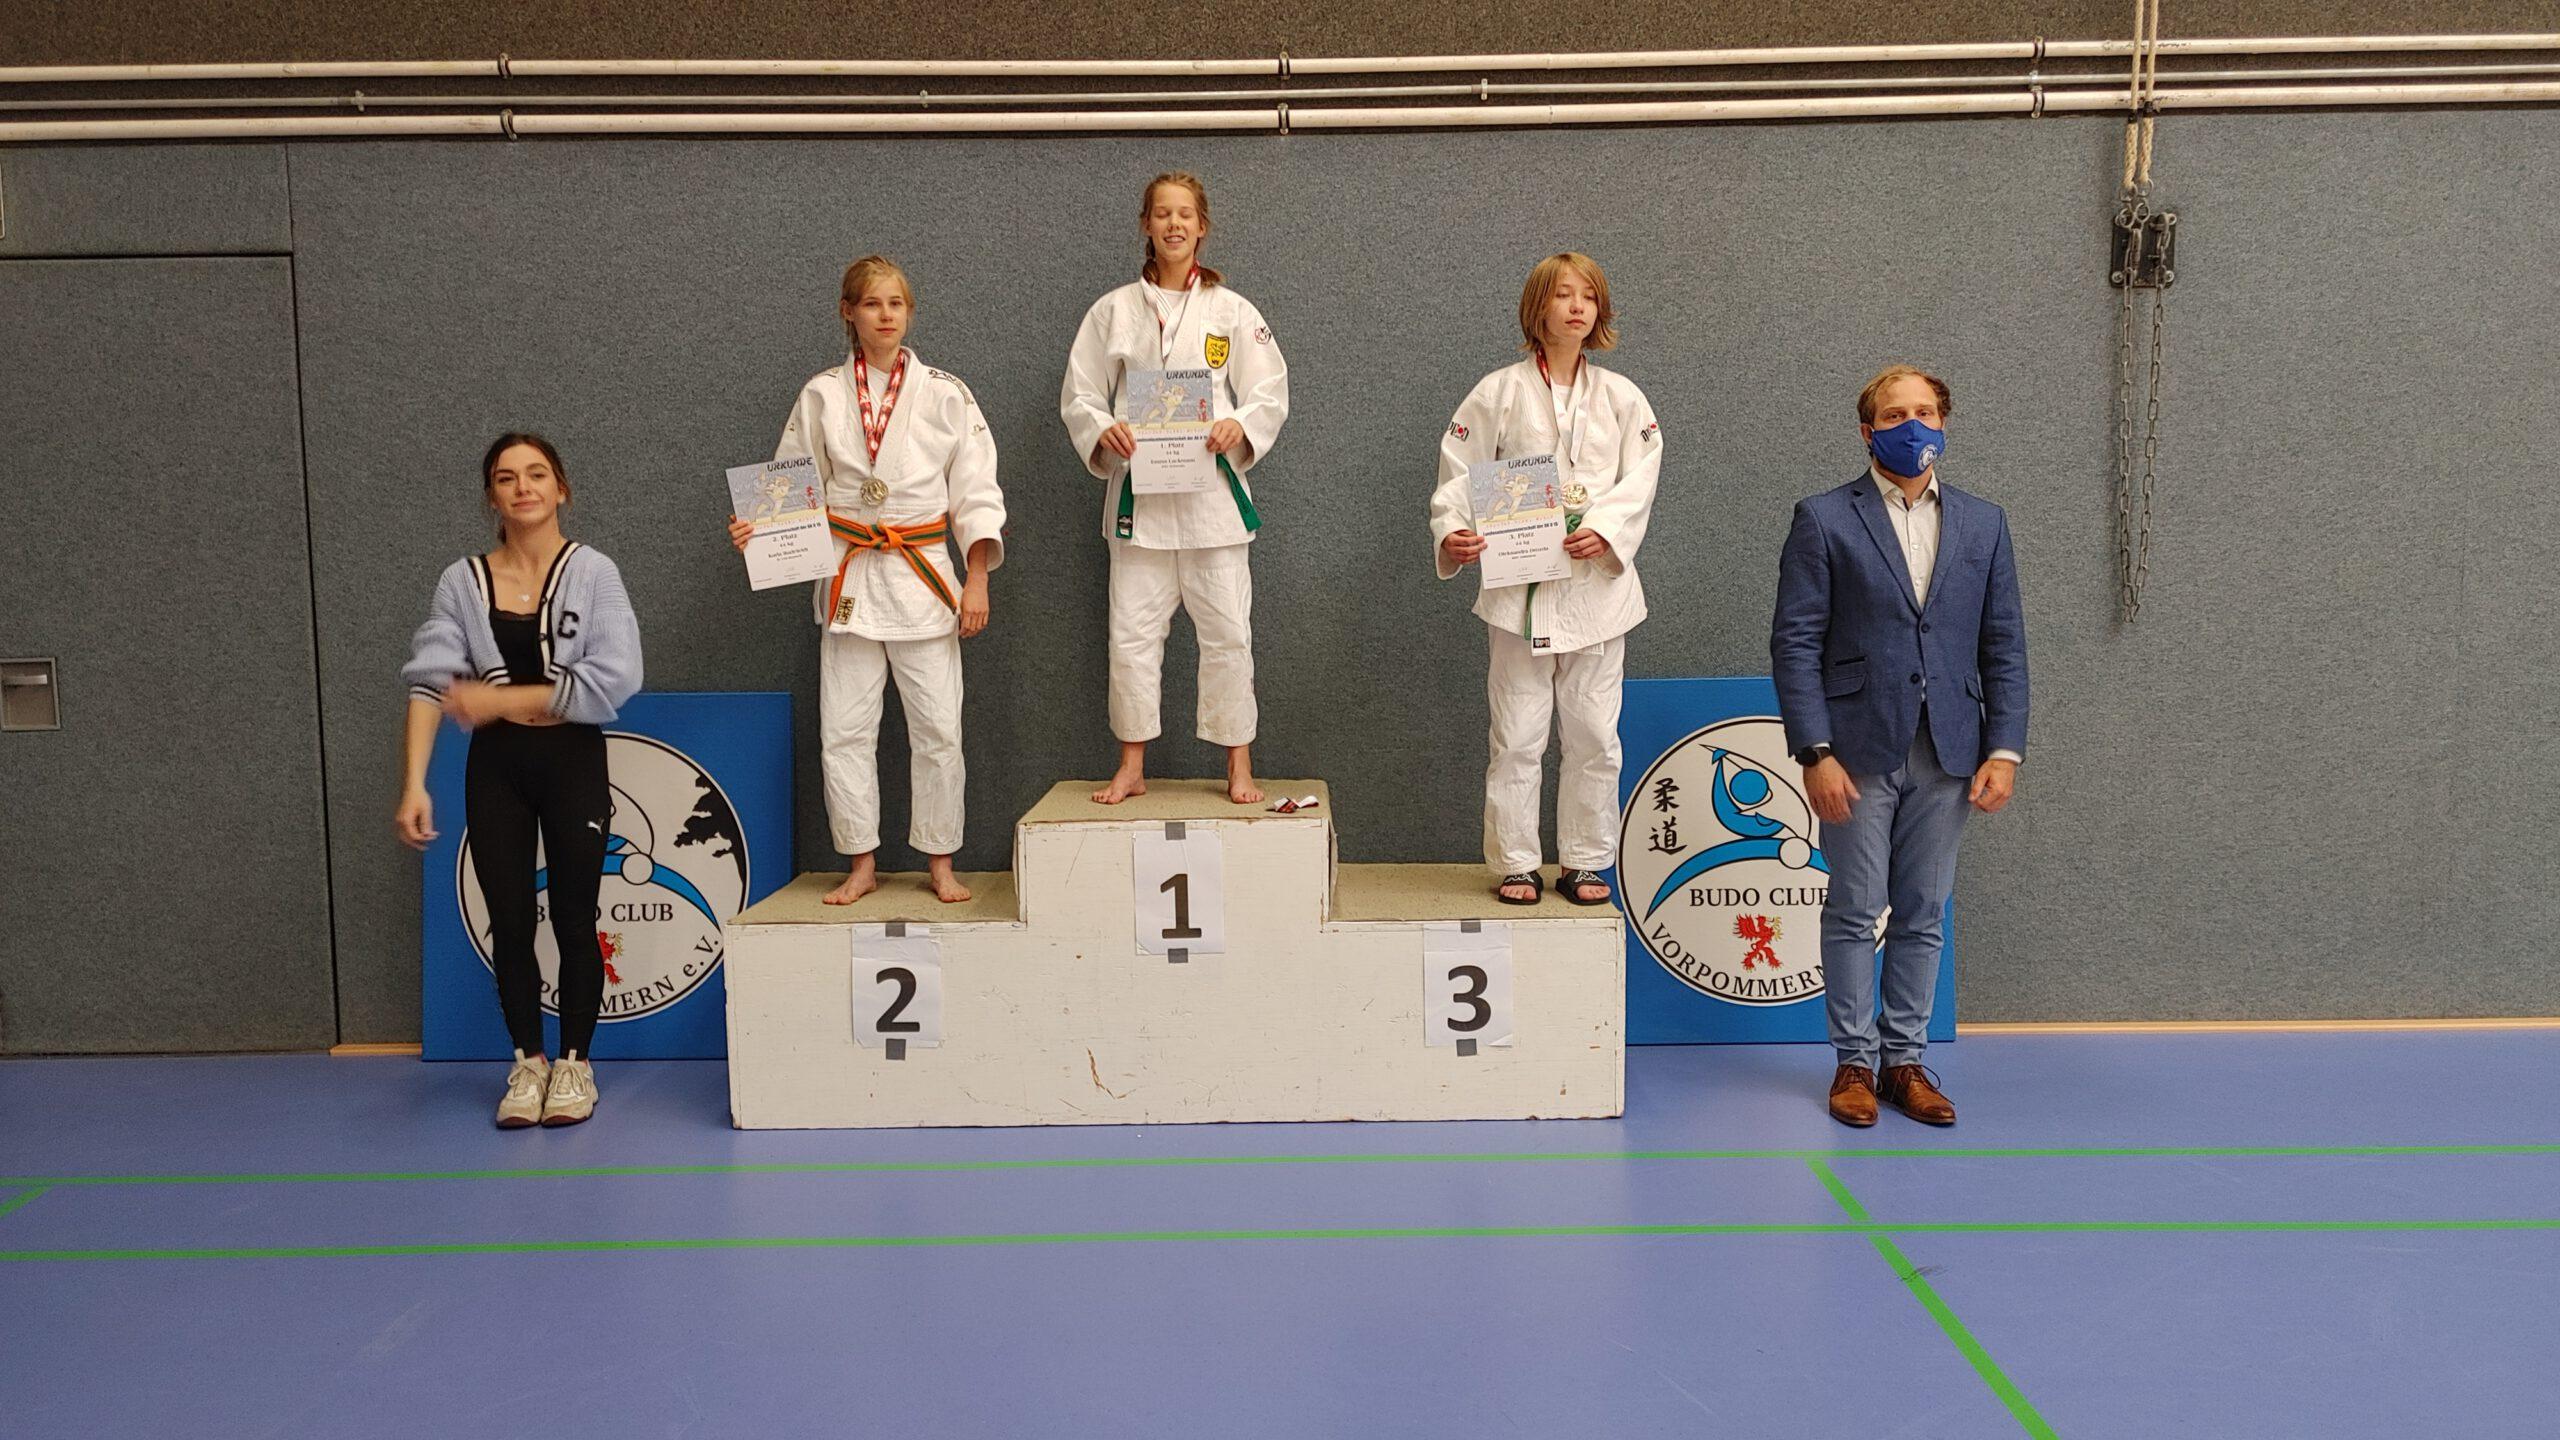 LEM U15 Greifswald 2021 Siegerehrung 1 Karla - Judo Rostock